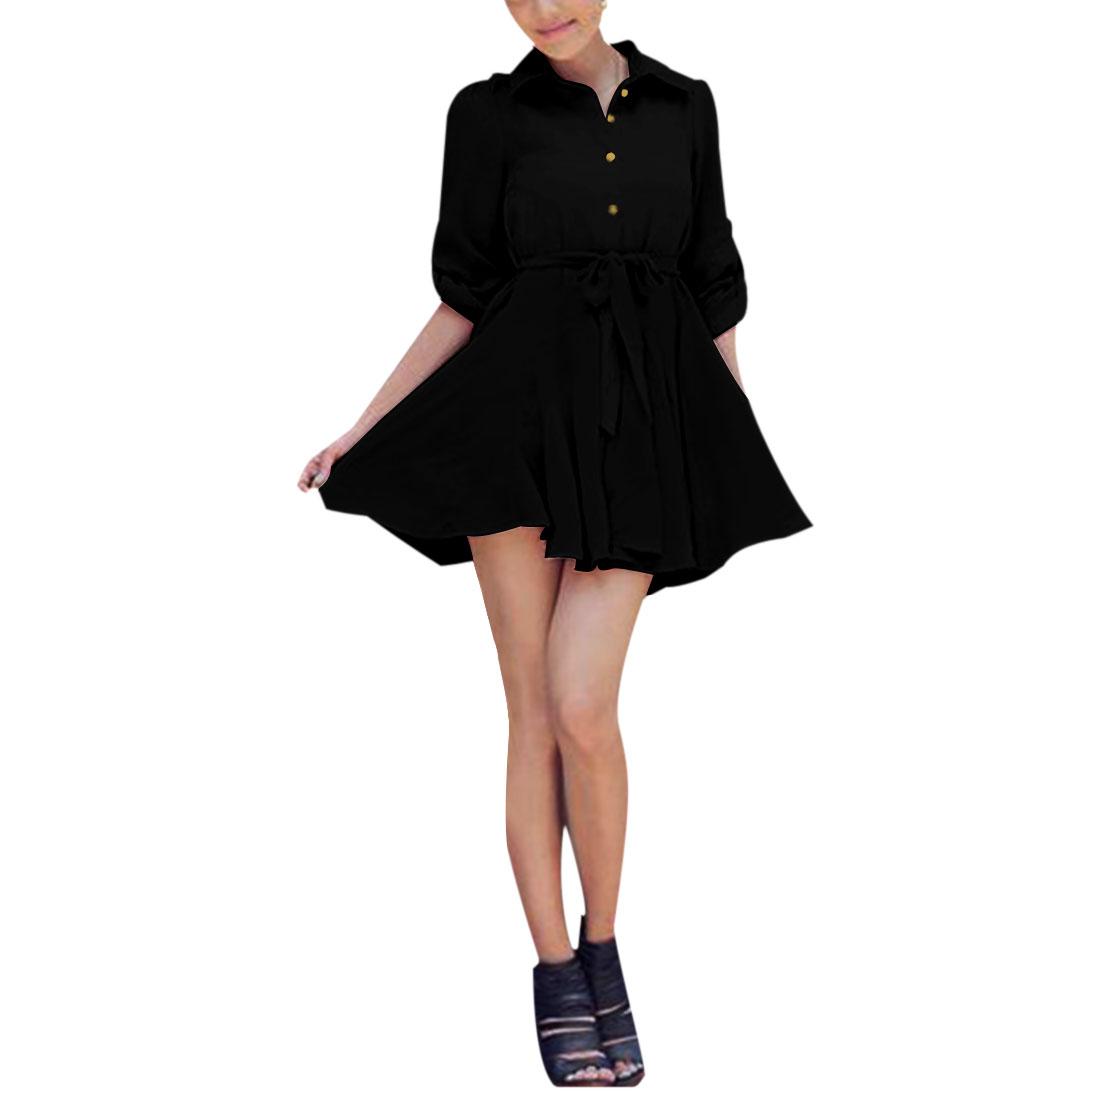 Ladies Puff Long Sleeve Point Collar Black Semi Sheer Chiffon Dress XS